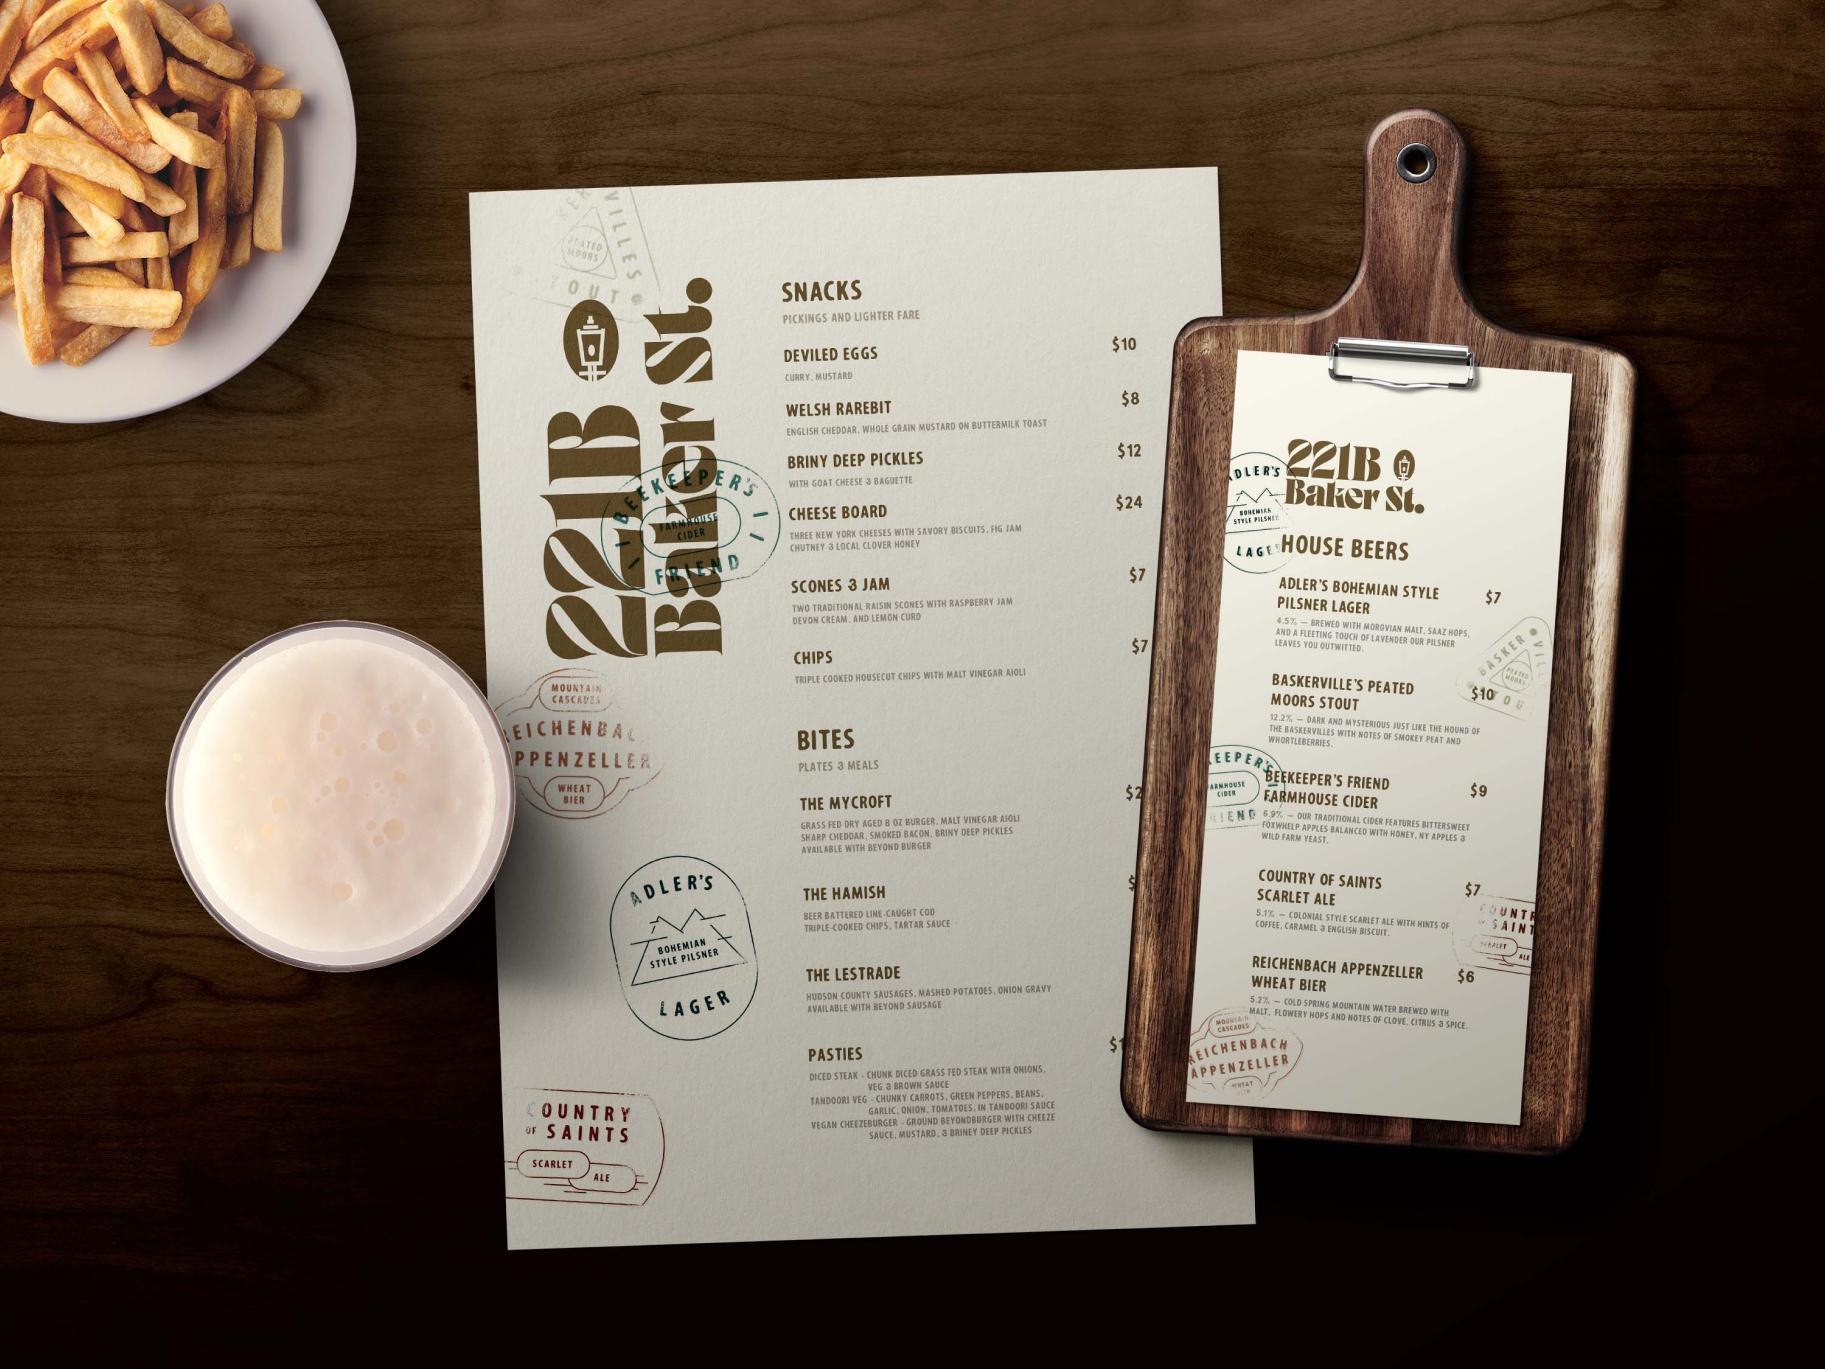 221B Baker St. menu & beer menu